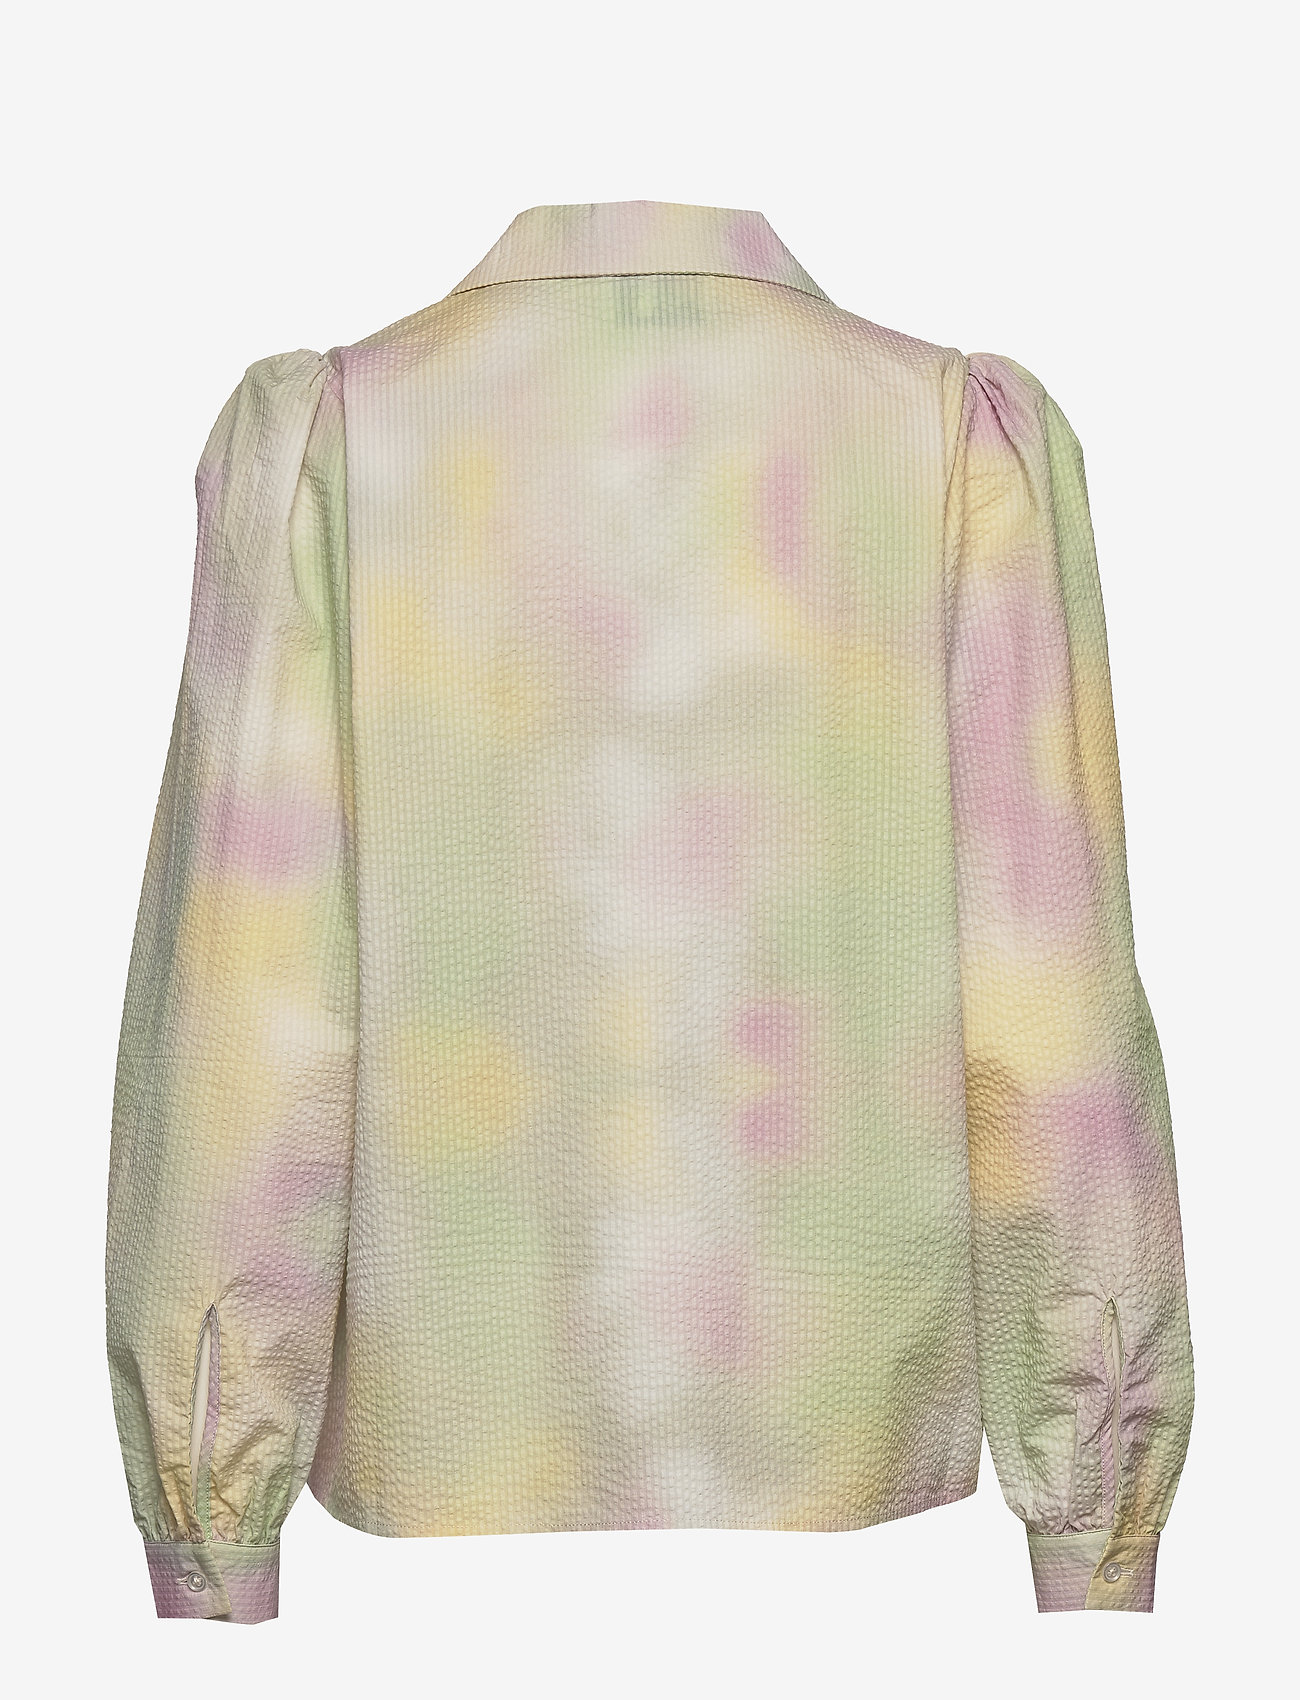 Nikki Shirt (Pastel Tie Dye) (71.40 €) - Just Female VJAyz